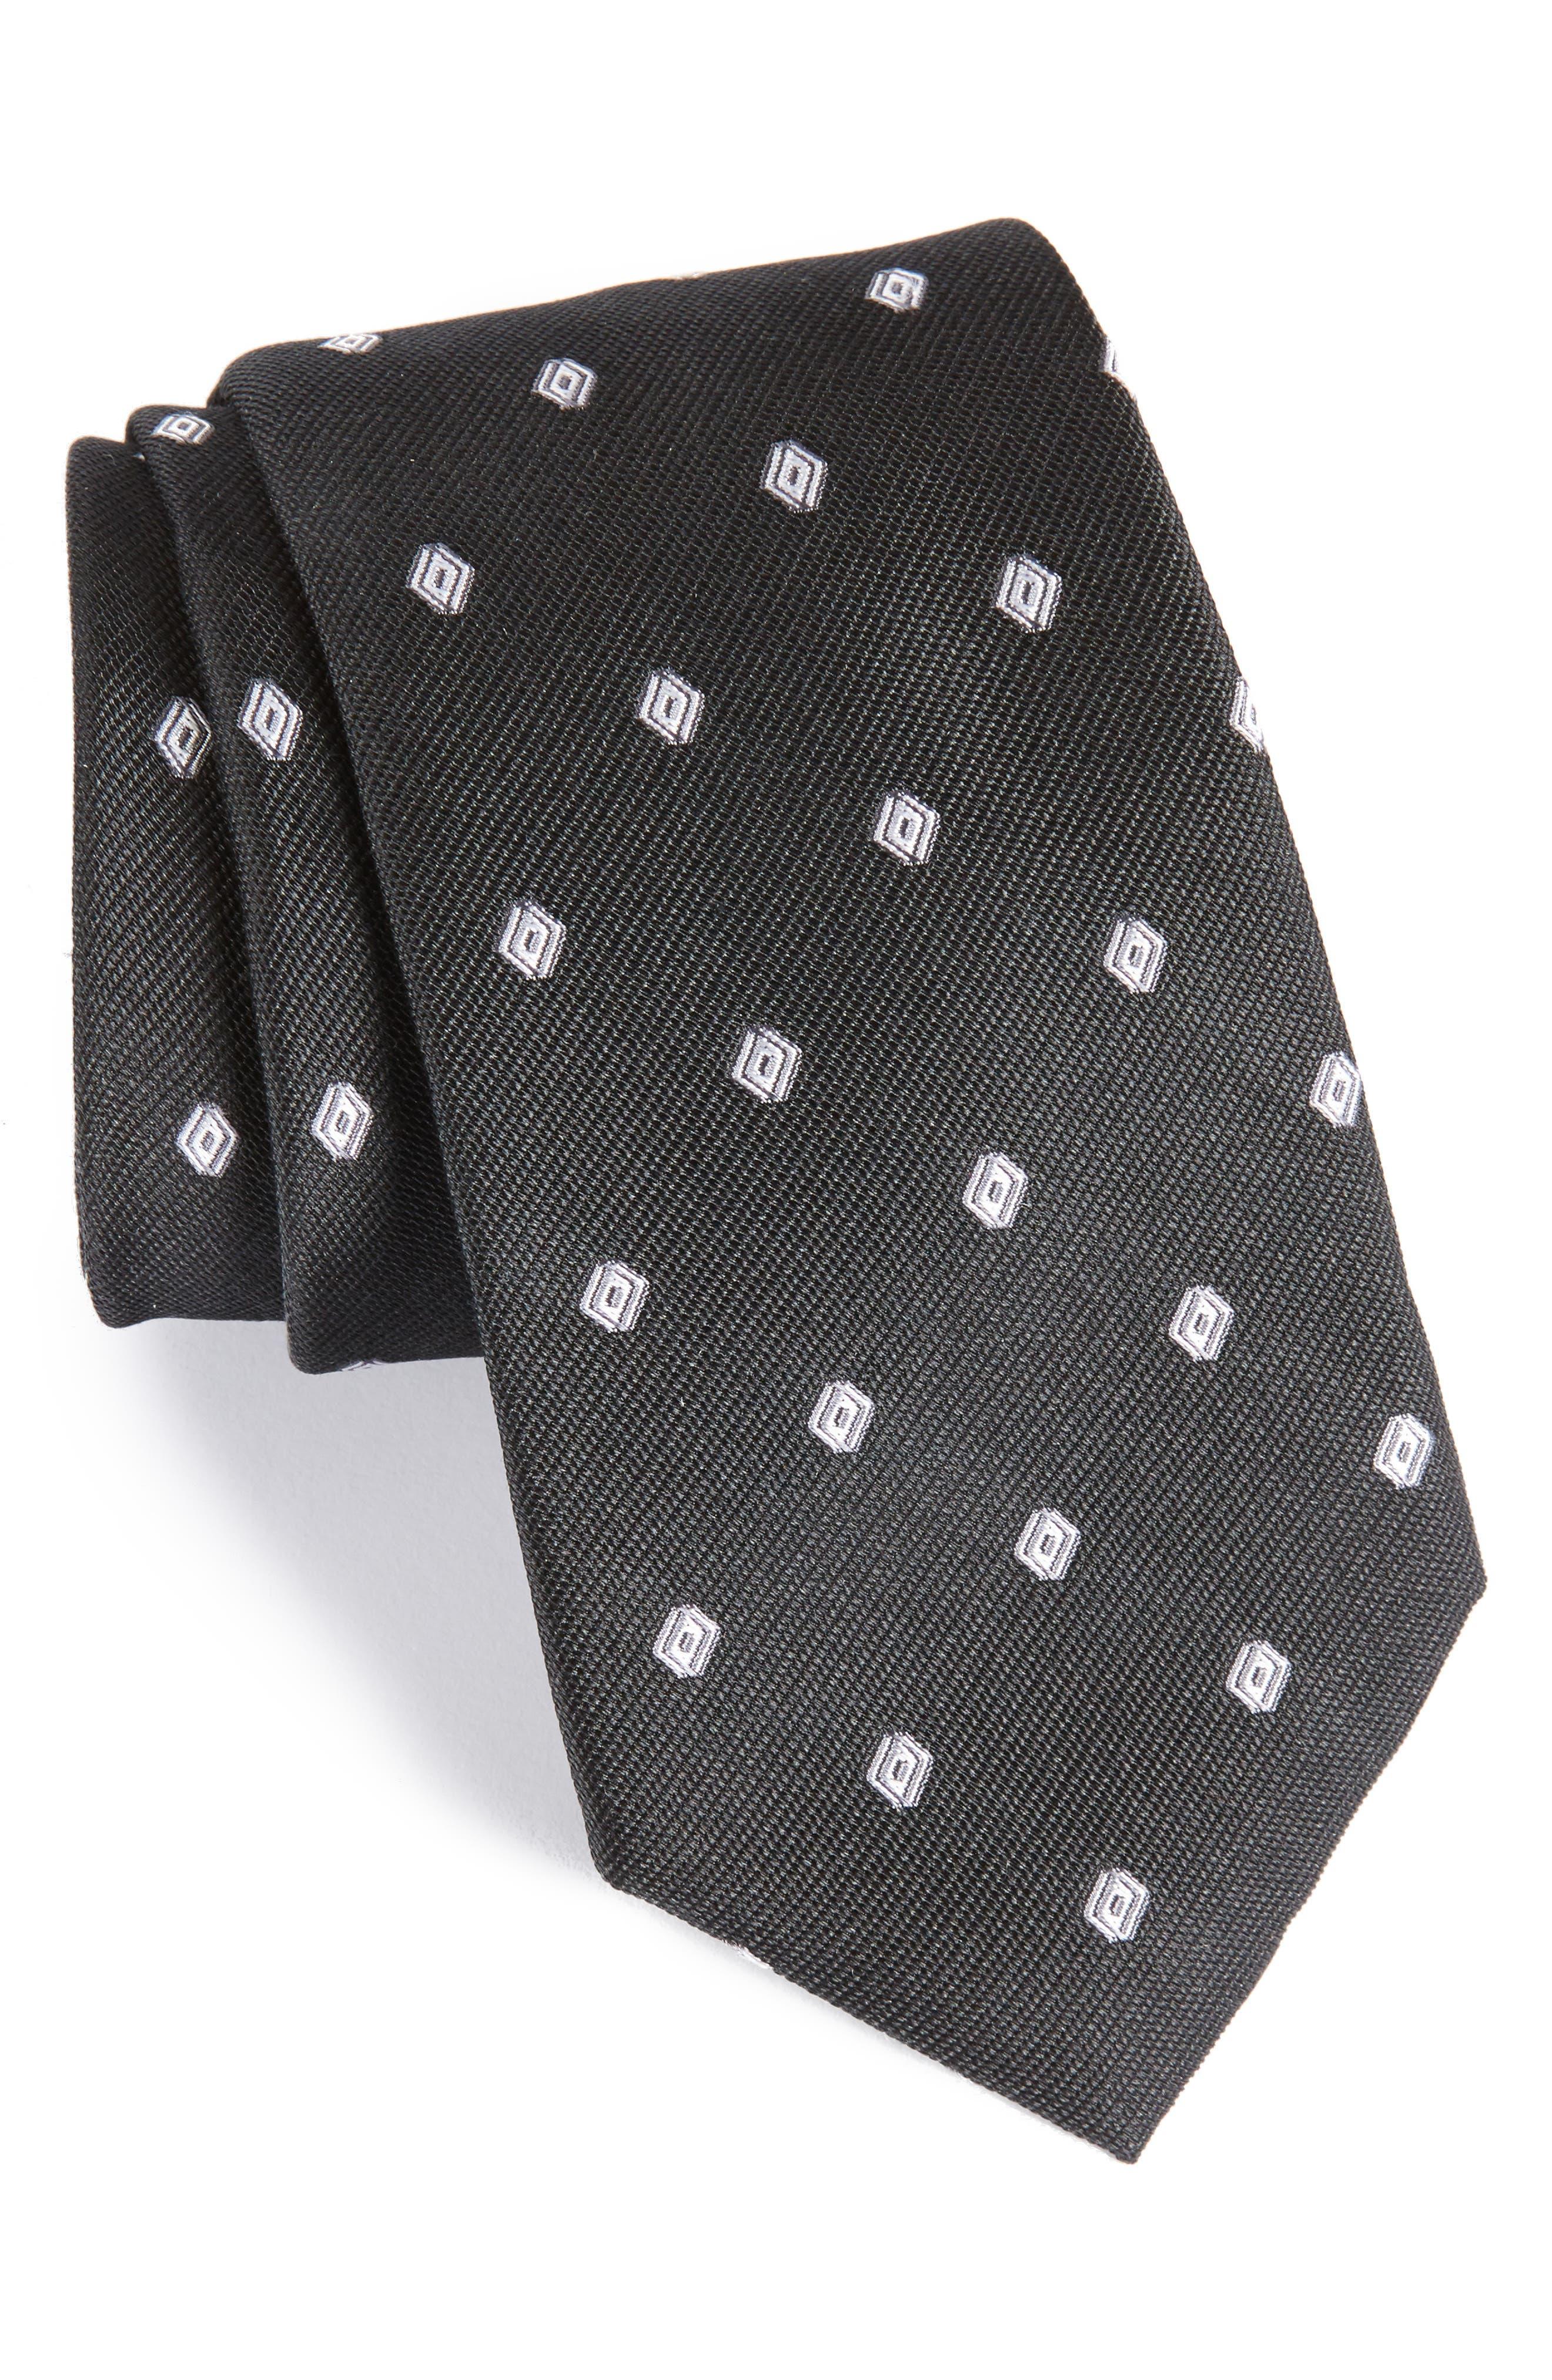 Kaleri Neat Diamond Grid Silk Tie,                             Main thumbnail 1, color,                             001